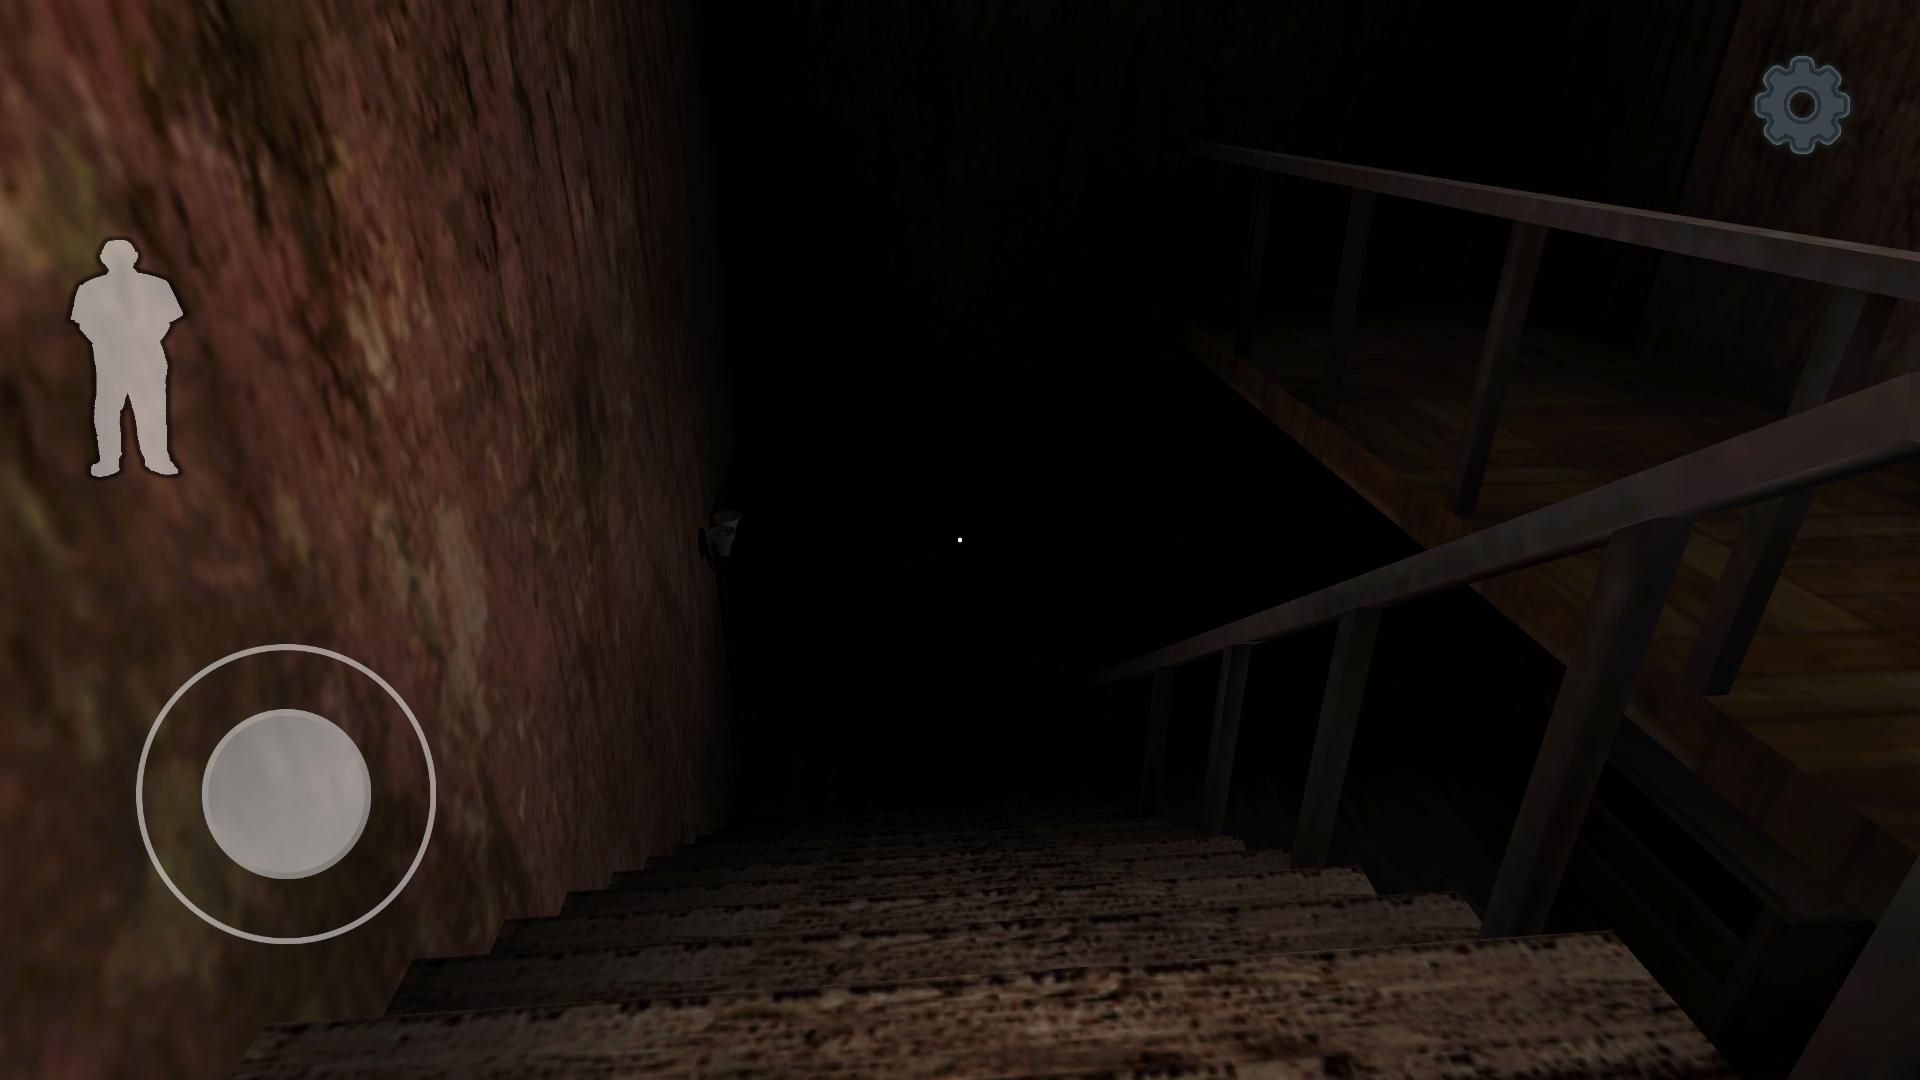 Evil Kid The Horror Game 1.1.9.5.4.4 Screenshot 3